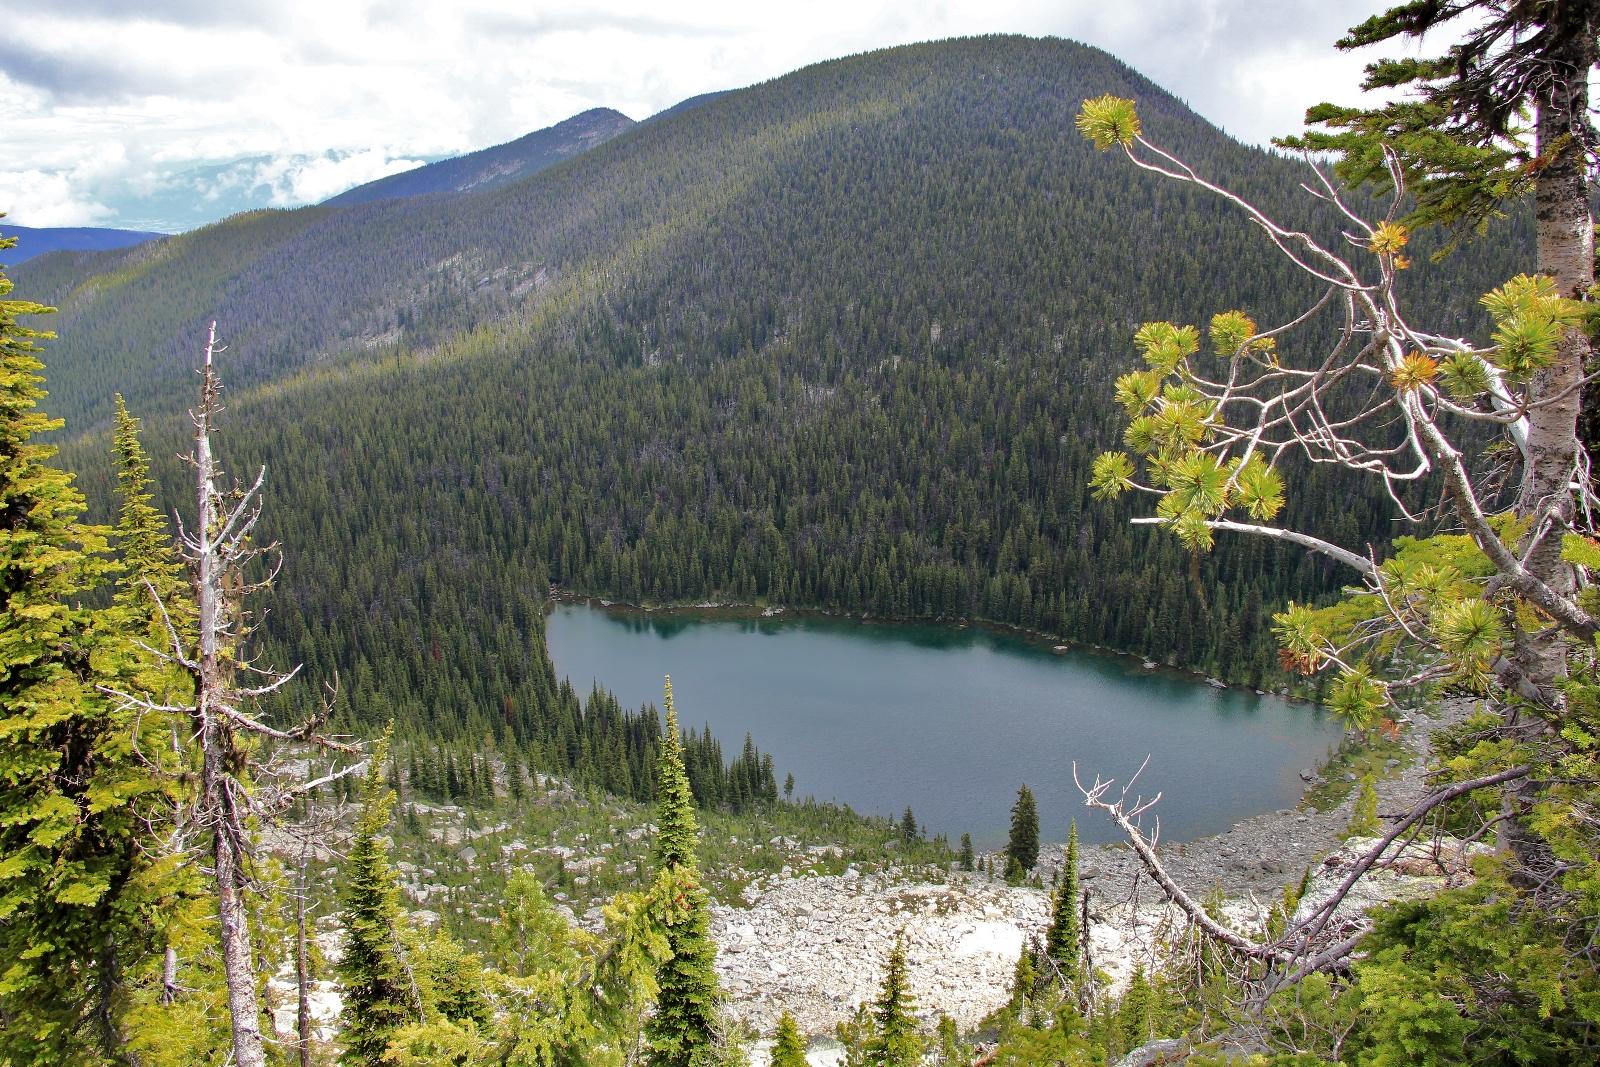 07-23-16-big-fisher-lake-bp-41